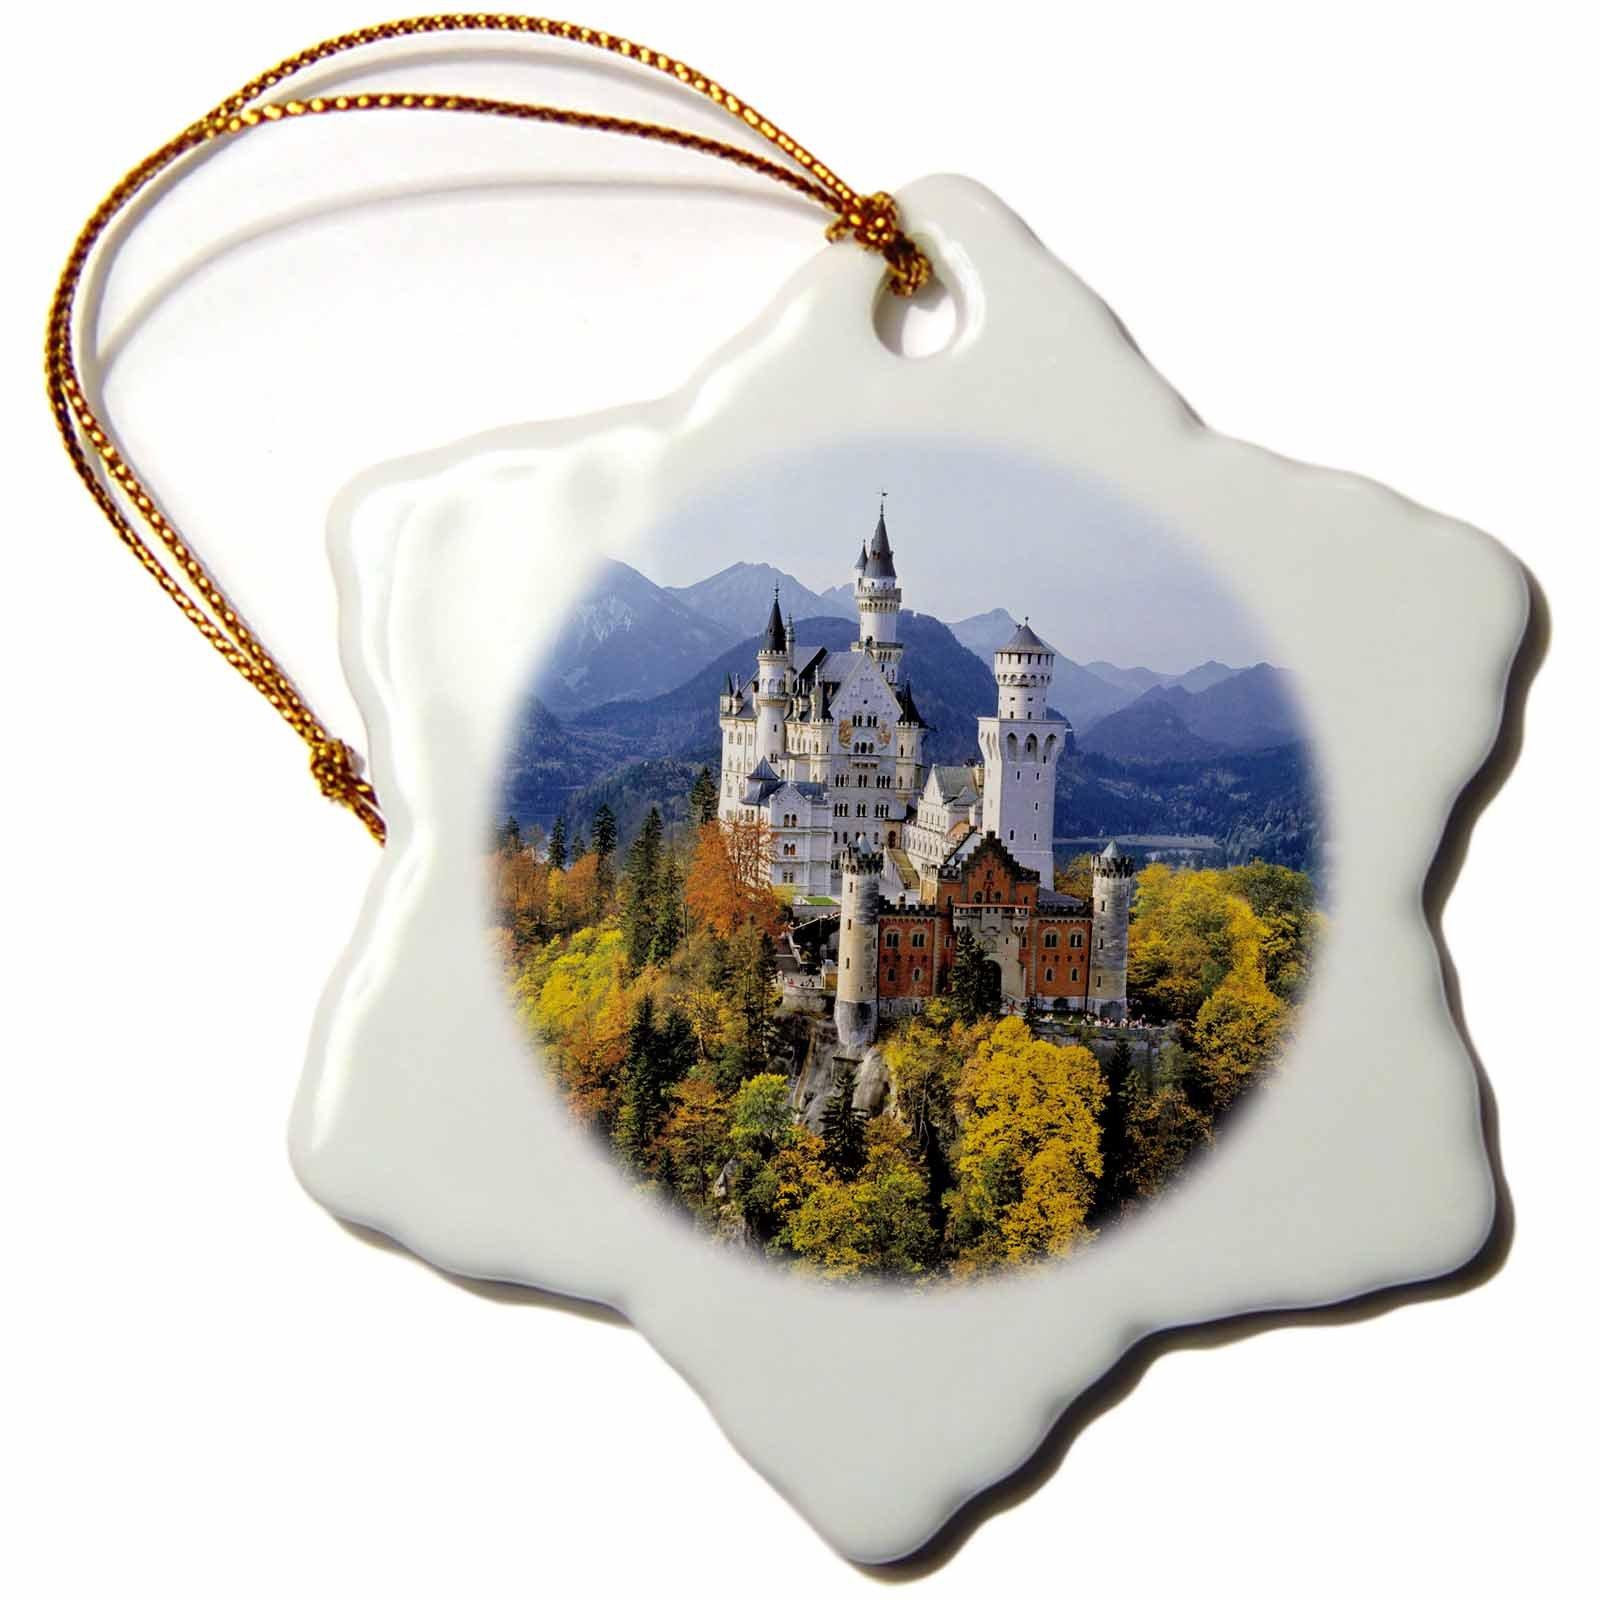 Germany Christmas Ornament: Amazon.com